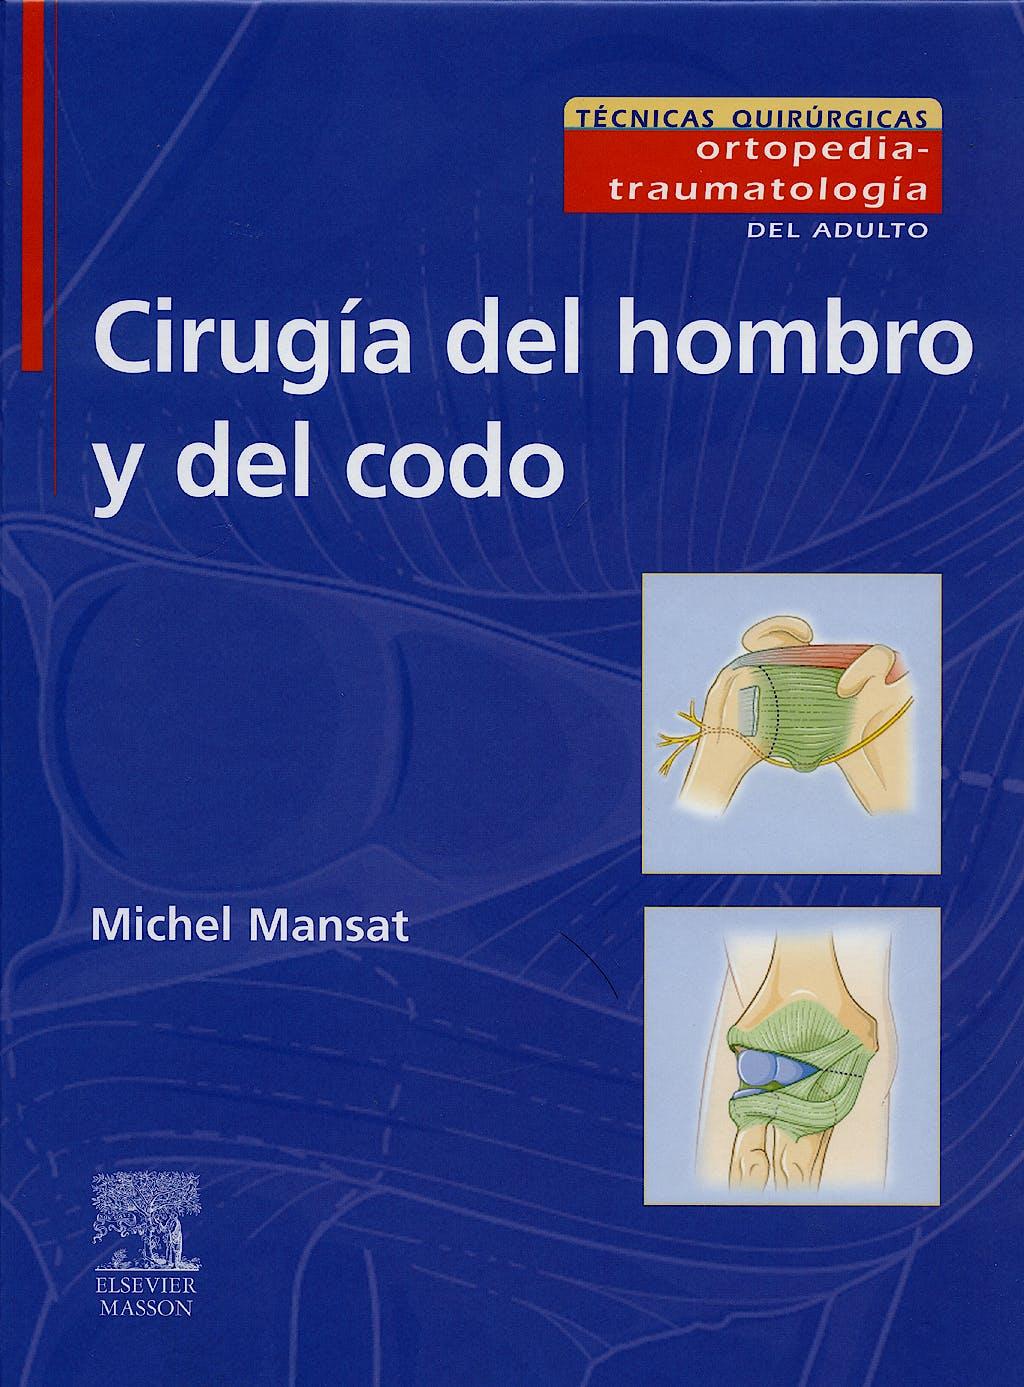 Portada del libro 9788445817179 Cirugia del Hombro y del Codo. Tecnicas Quirurgicas: Ortopedia-Traumatologia del Adulto